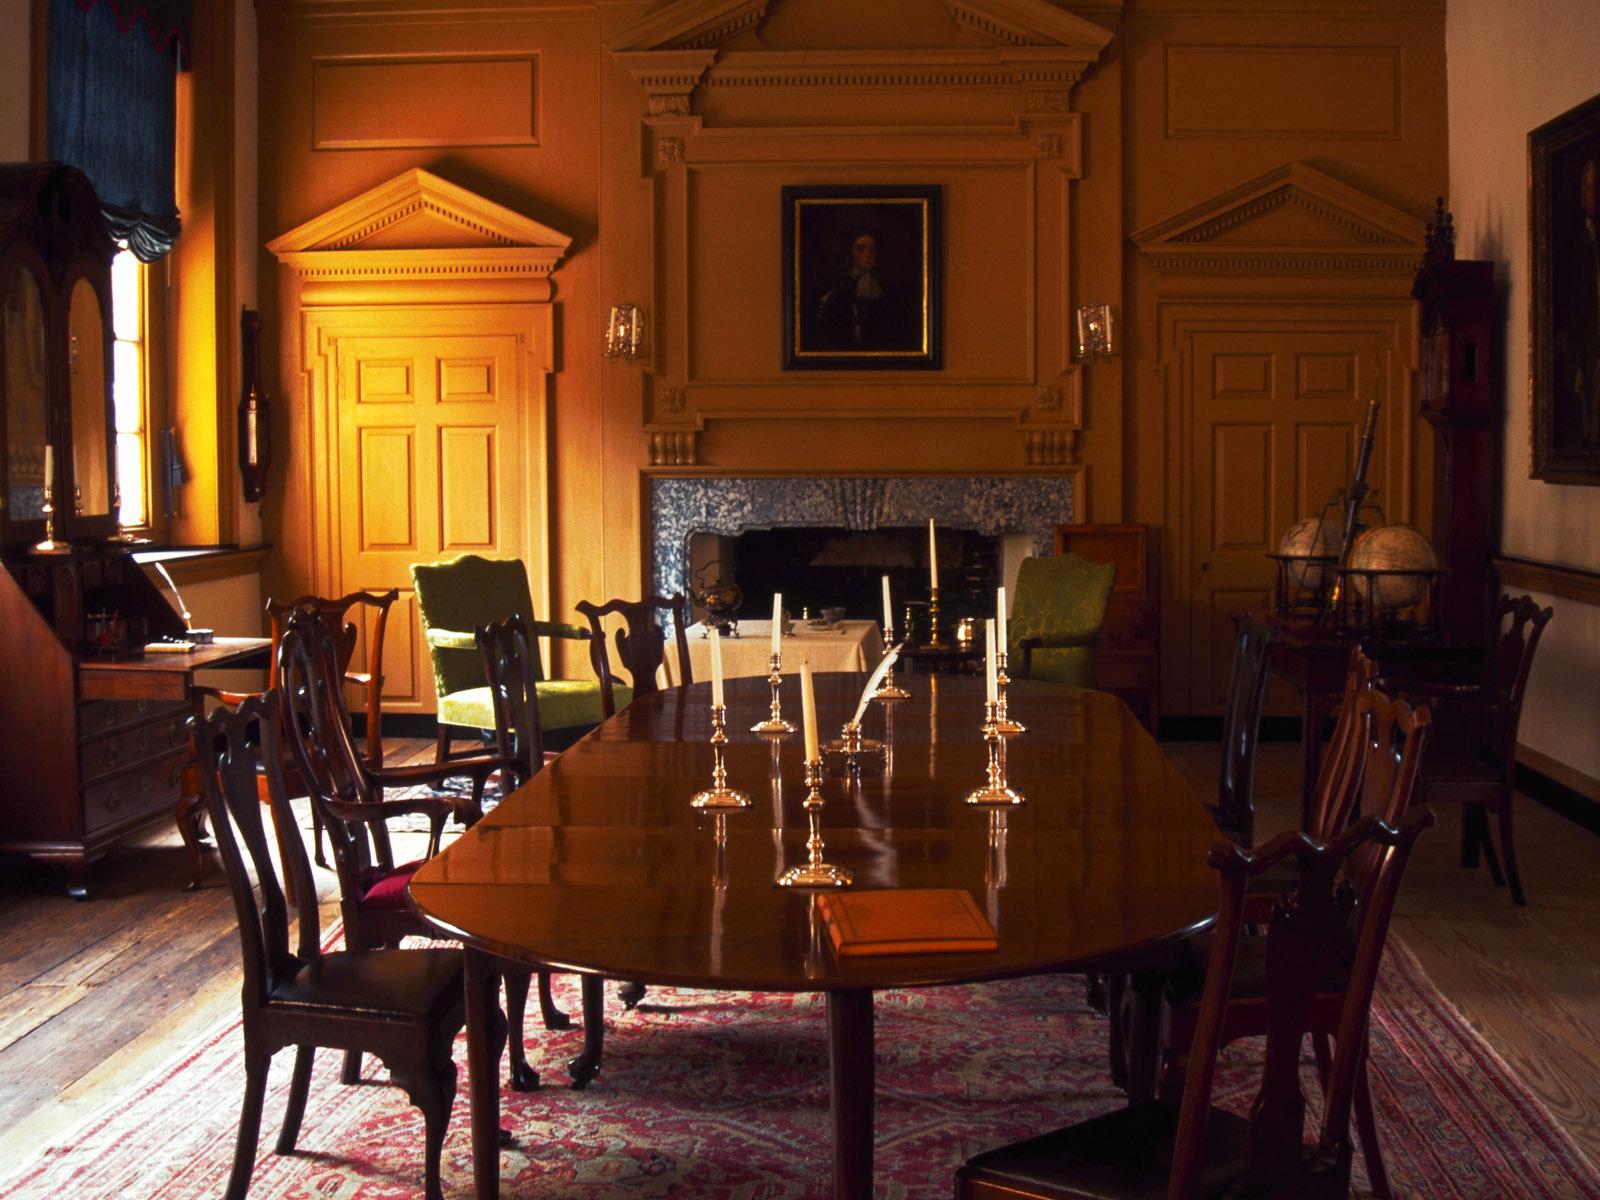 Traditoinal-dining-room-decor Traditoinal dining room decor